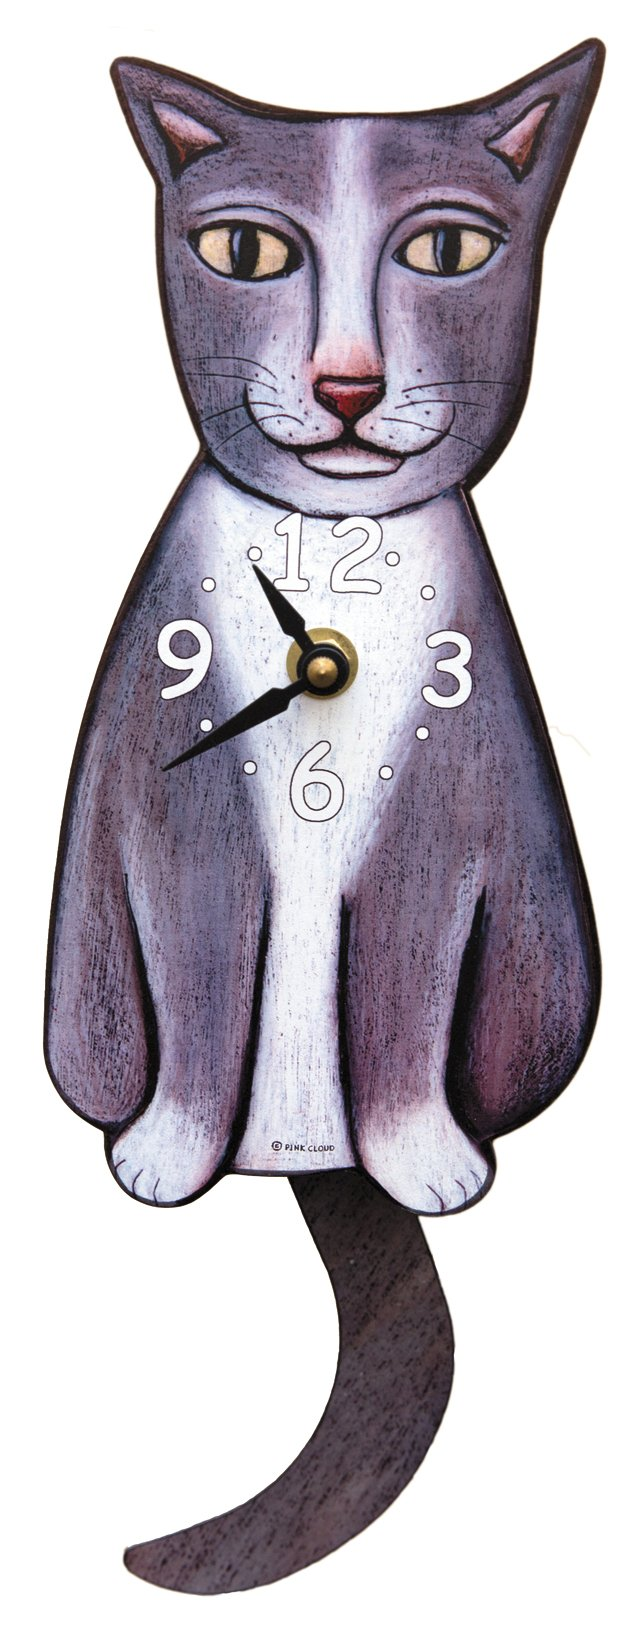 carytown_gift_guide_pets_cat_clock_DOMINIC_HERNANDEZ_rp1117.jpg